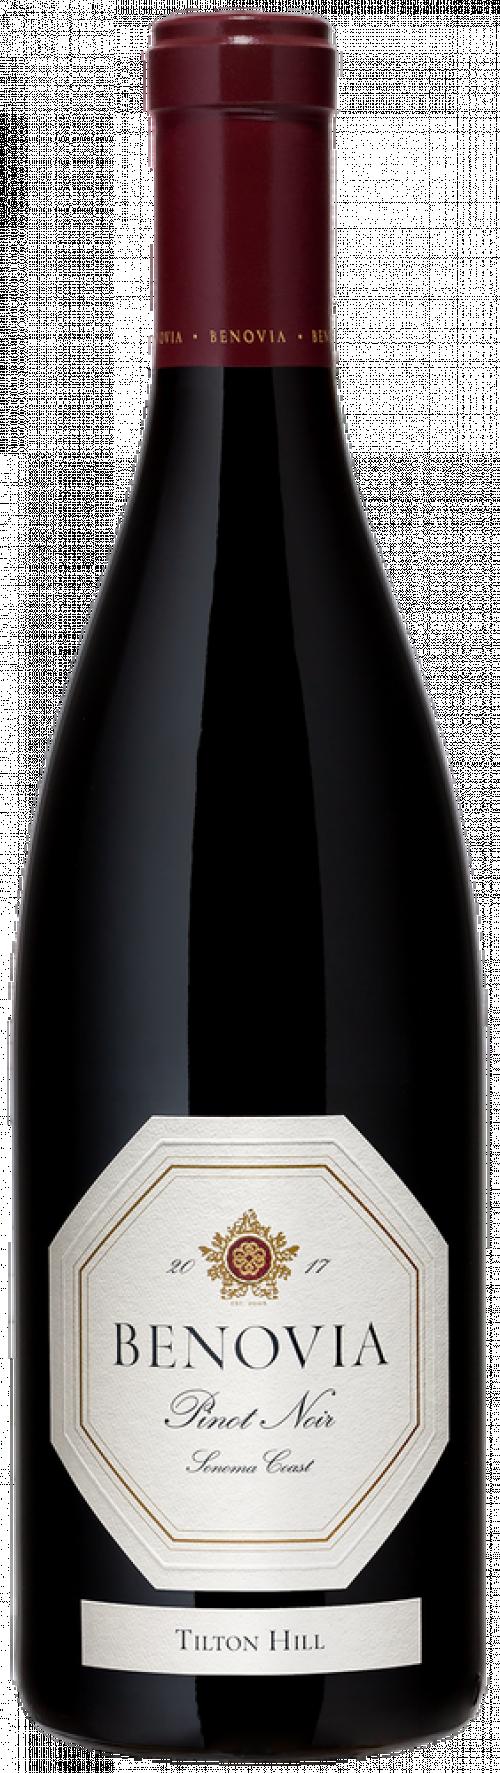 2015 Benovia Tilton Hill Pinot Noir 750ml